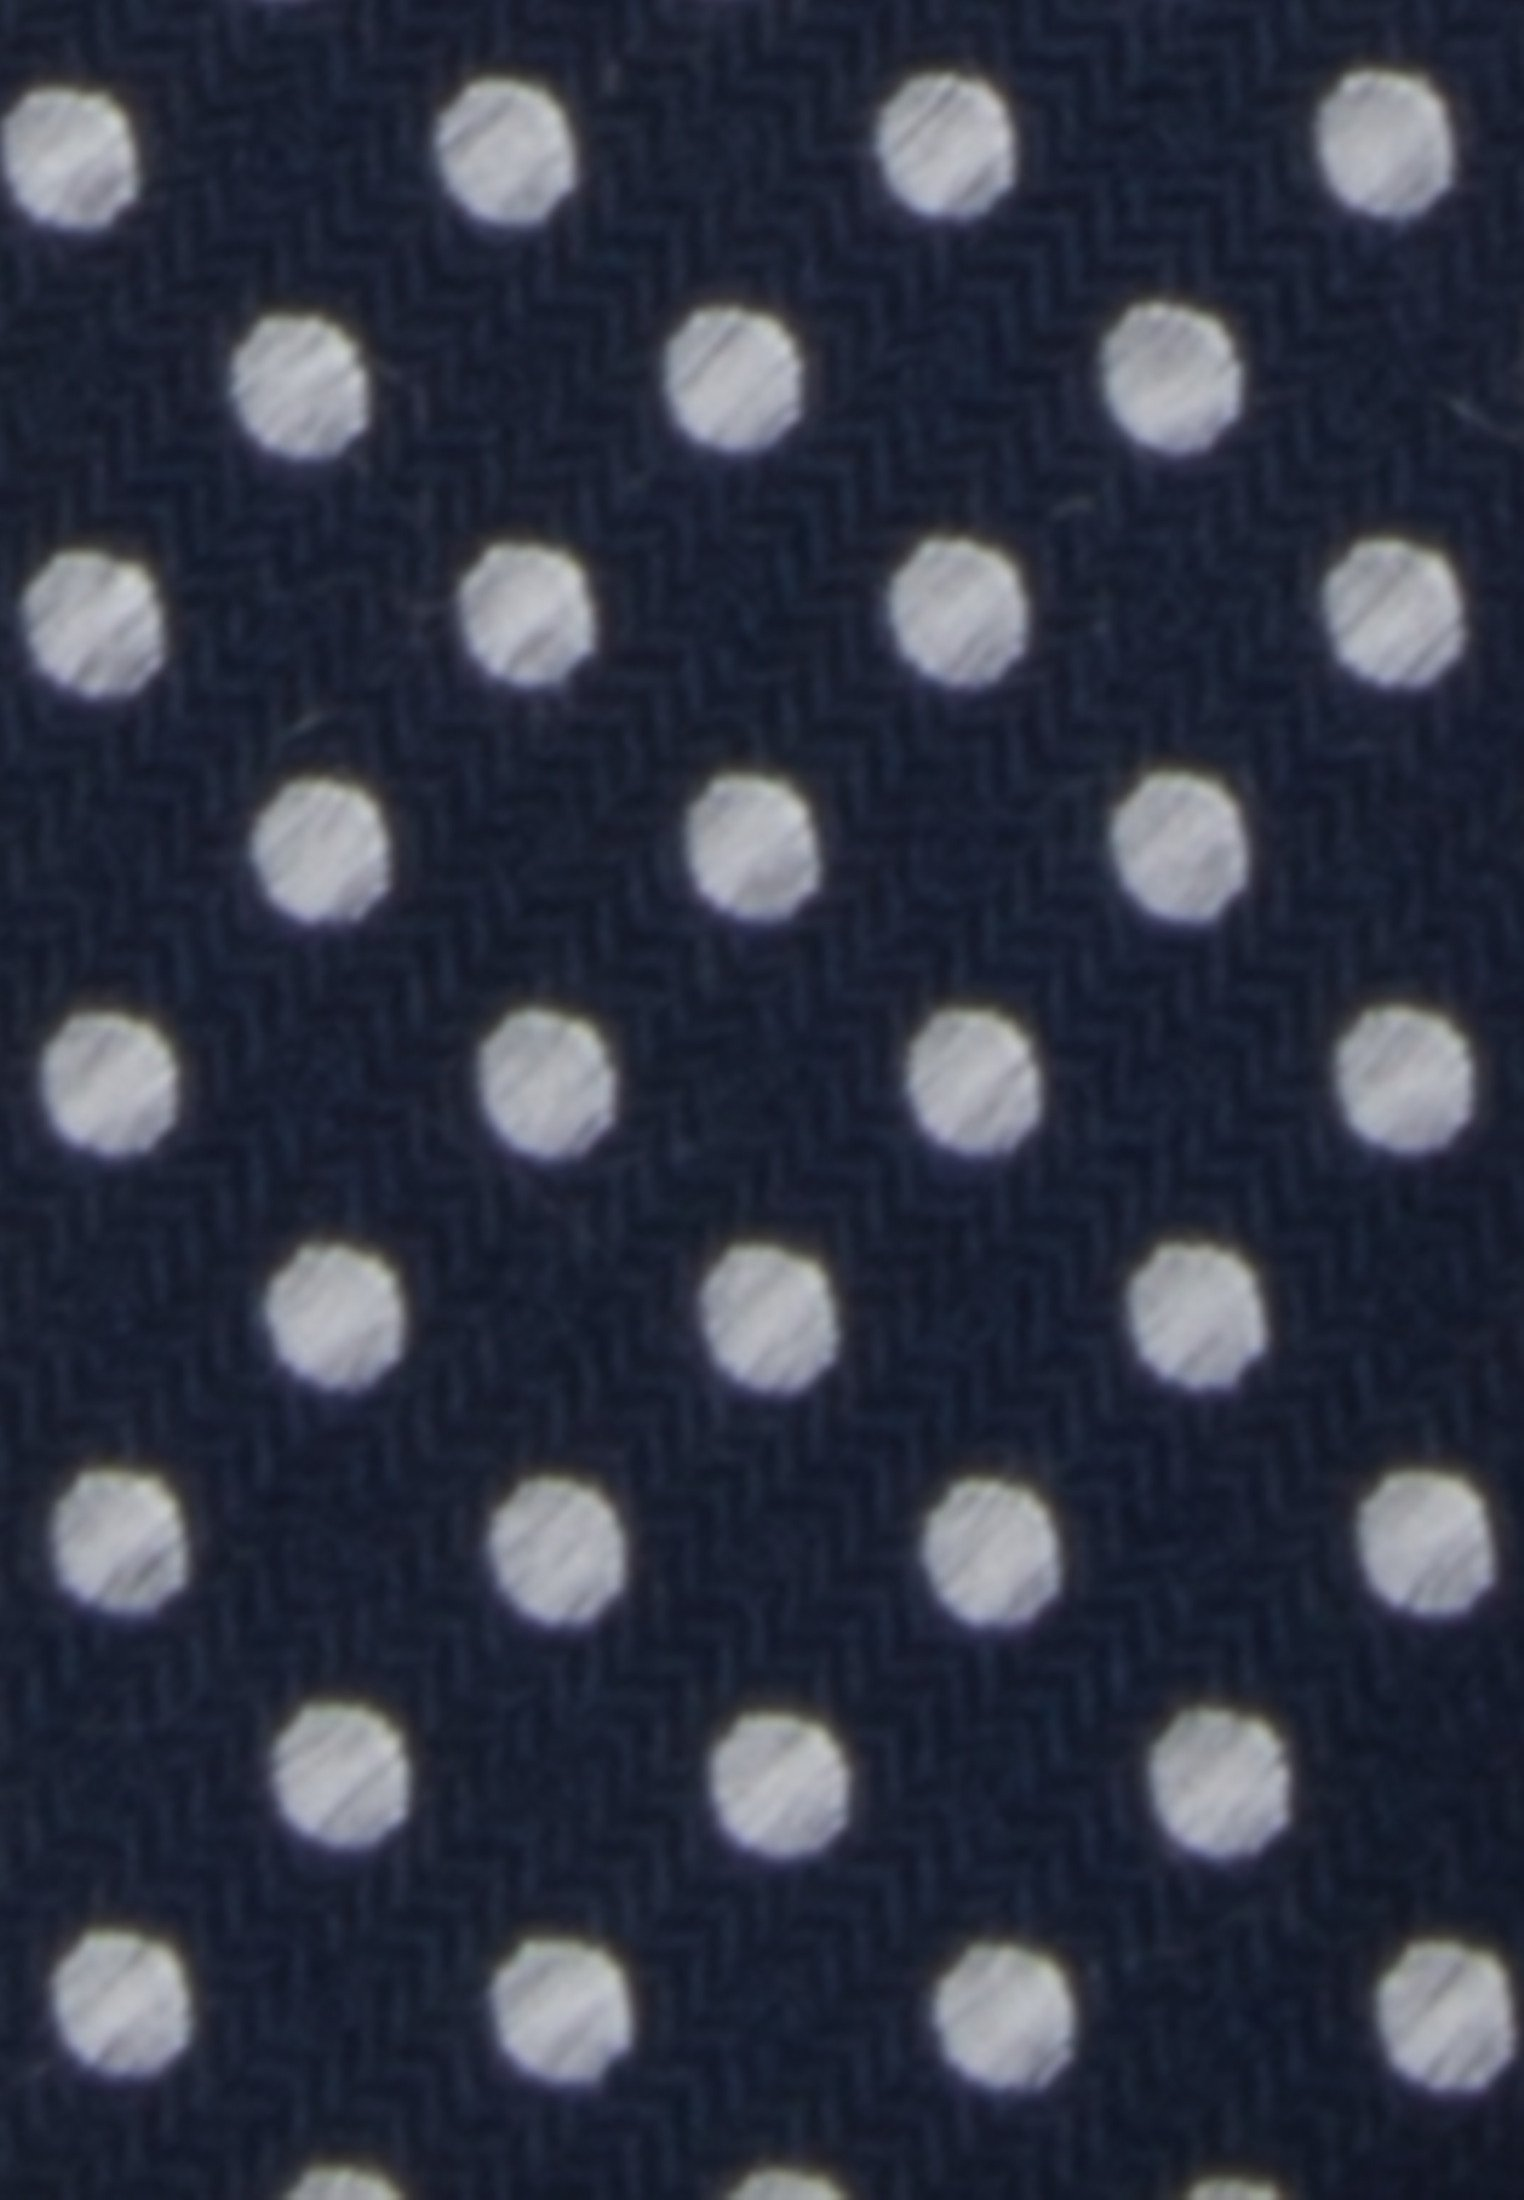 Seidensticker Krawatte - dunkelblau - Herrenaccessoires iaKoF